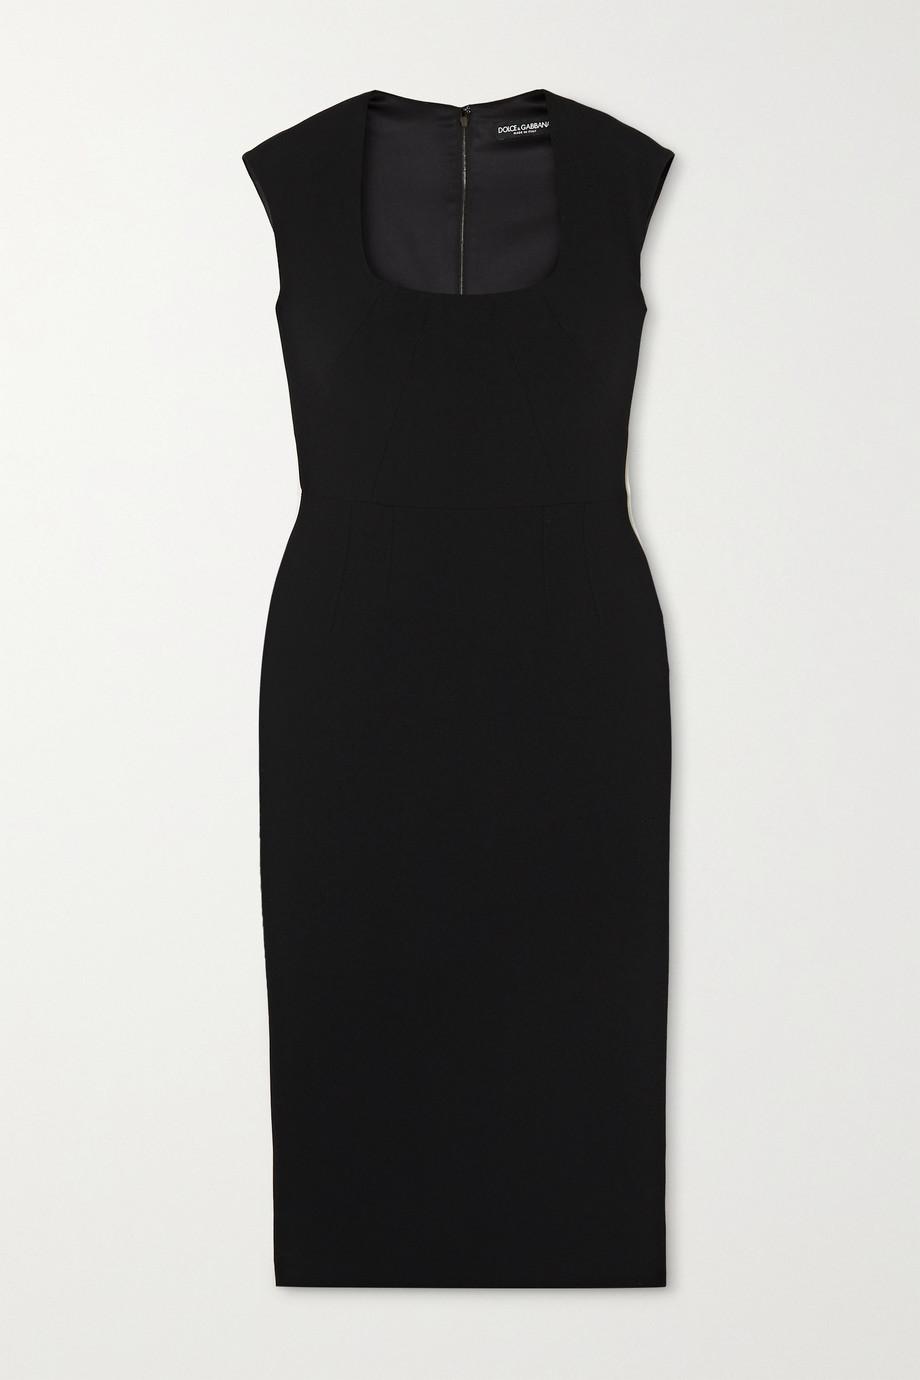 Dolce & Gabbana Crepe midi dress